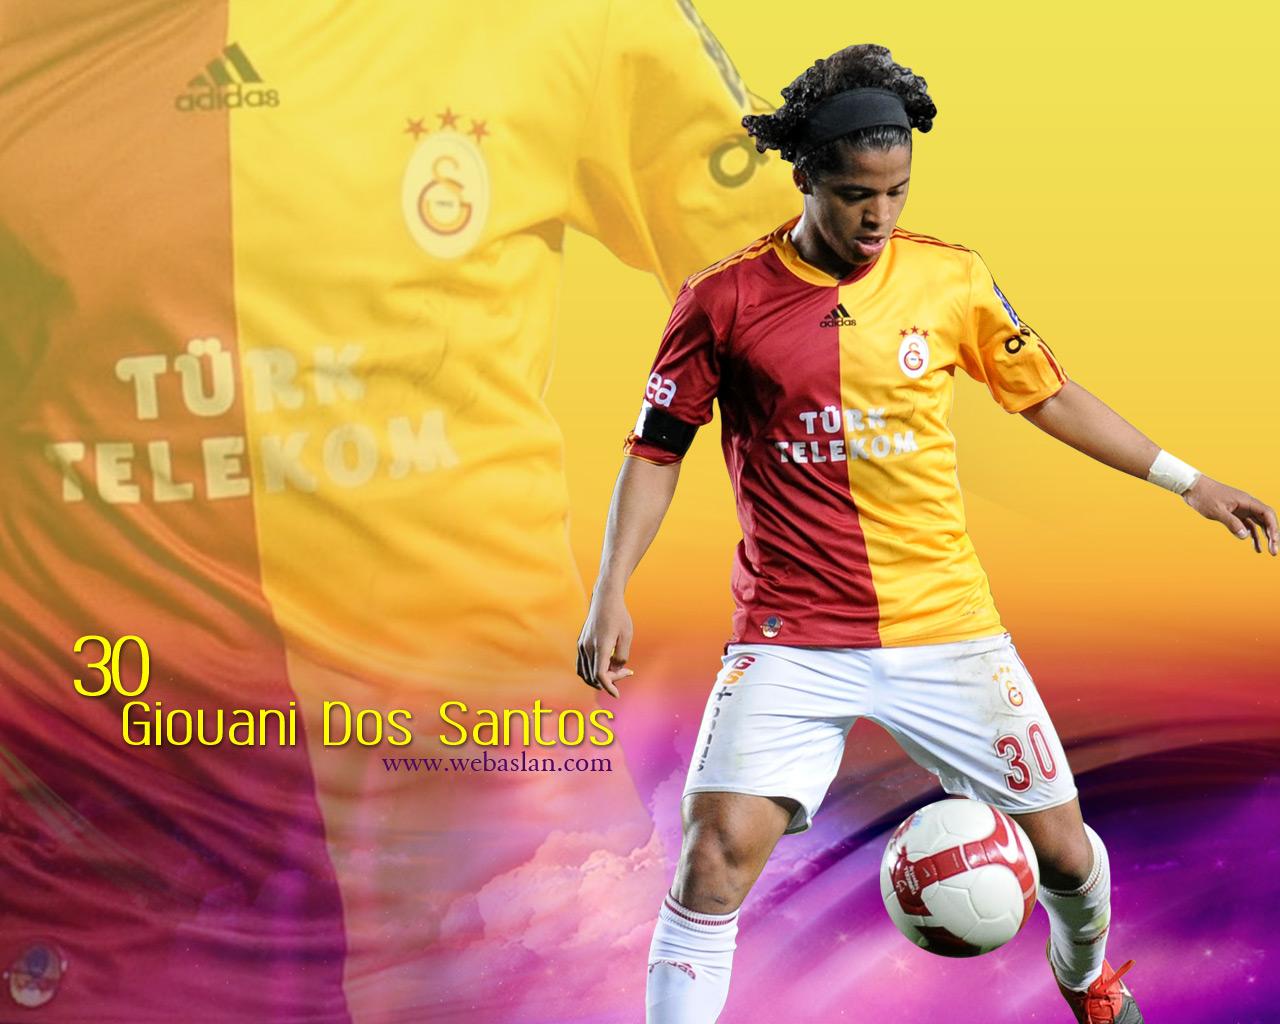 Giovani Dos Santos - Galatasaray SK 2009/2010 - THANK U GiO !